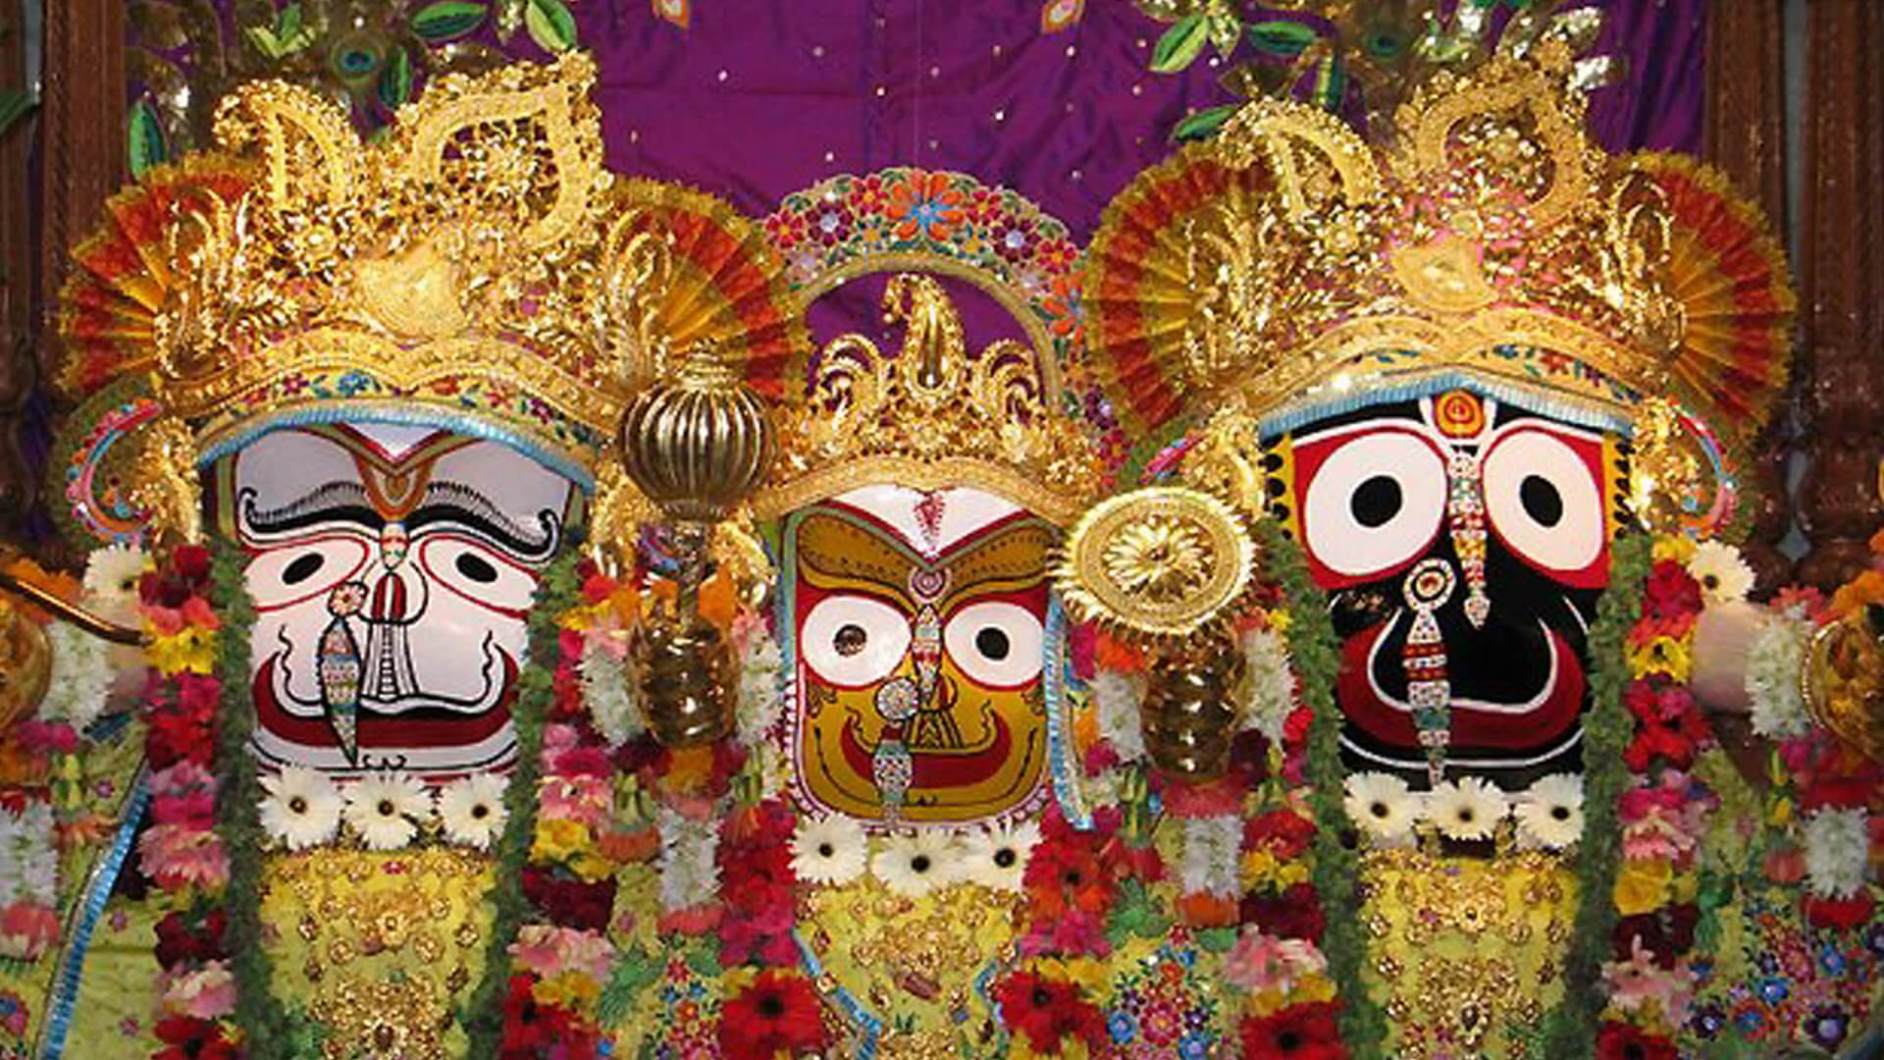 The unfinished Jagannath idol at Puri